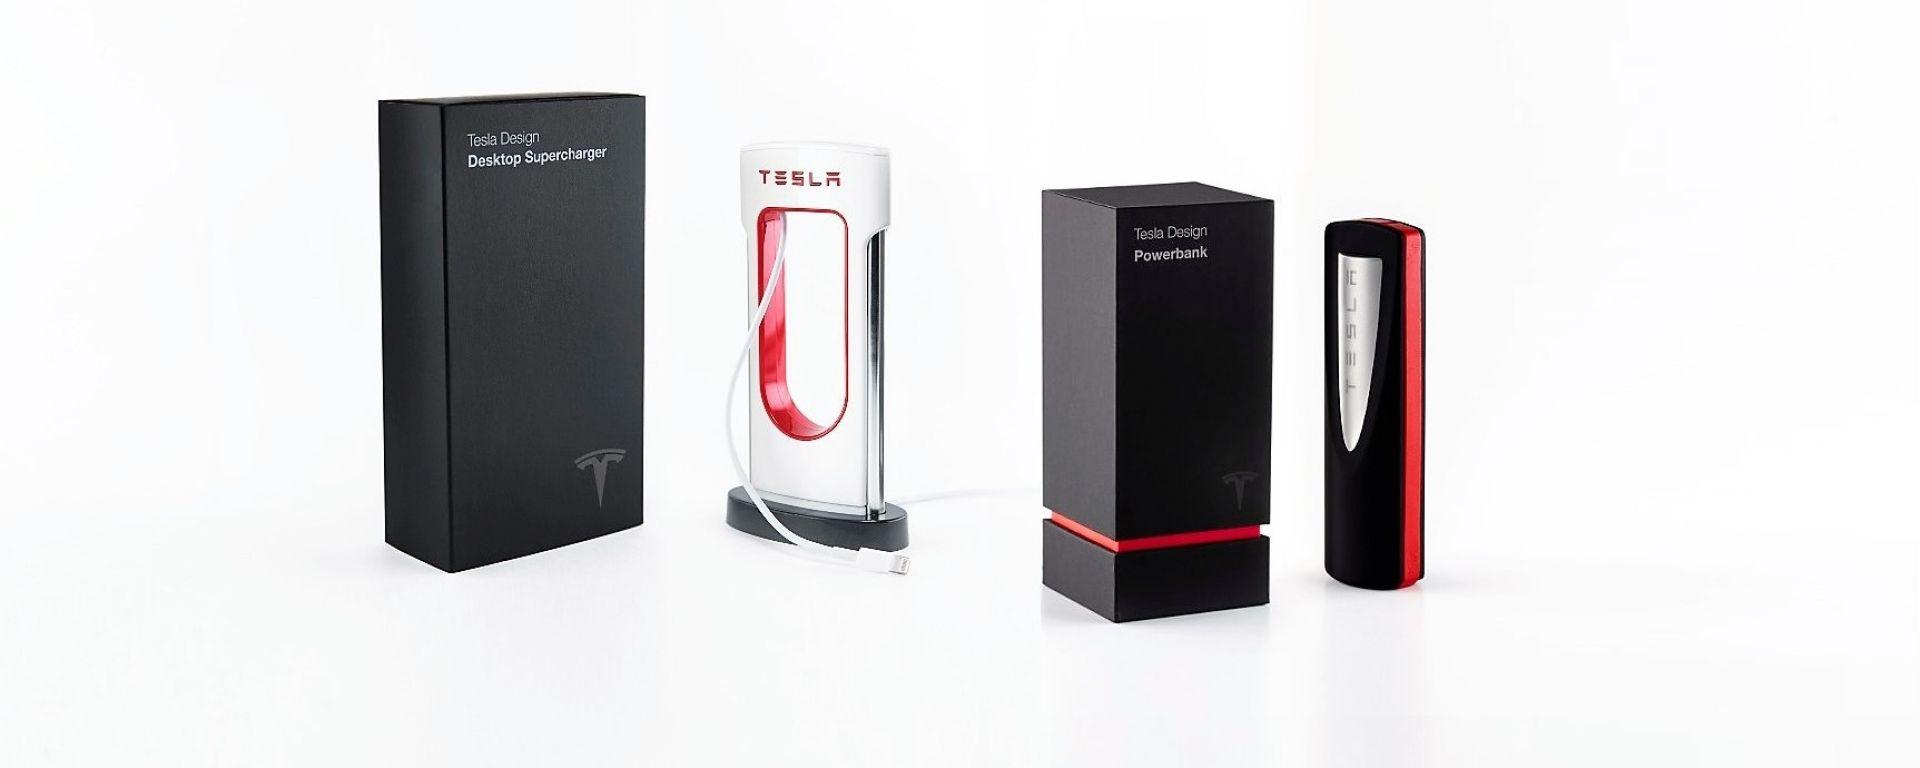 Tesla Desktop Supercharger e Tesla Powerbank